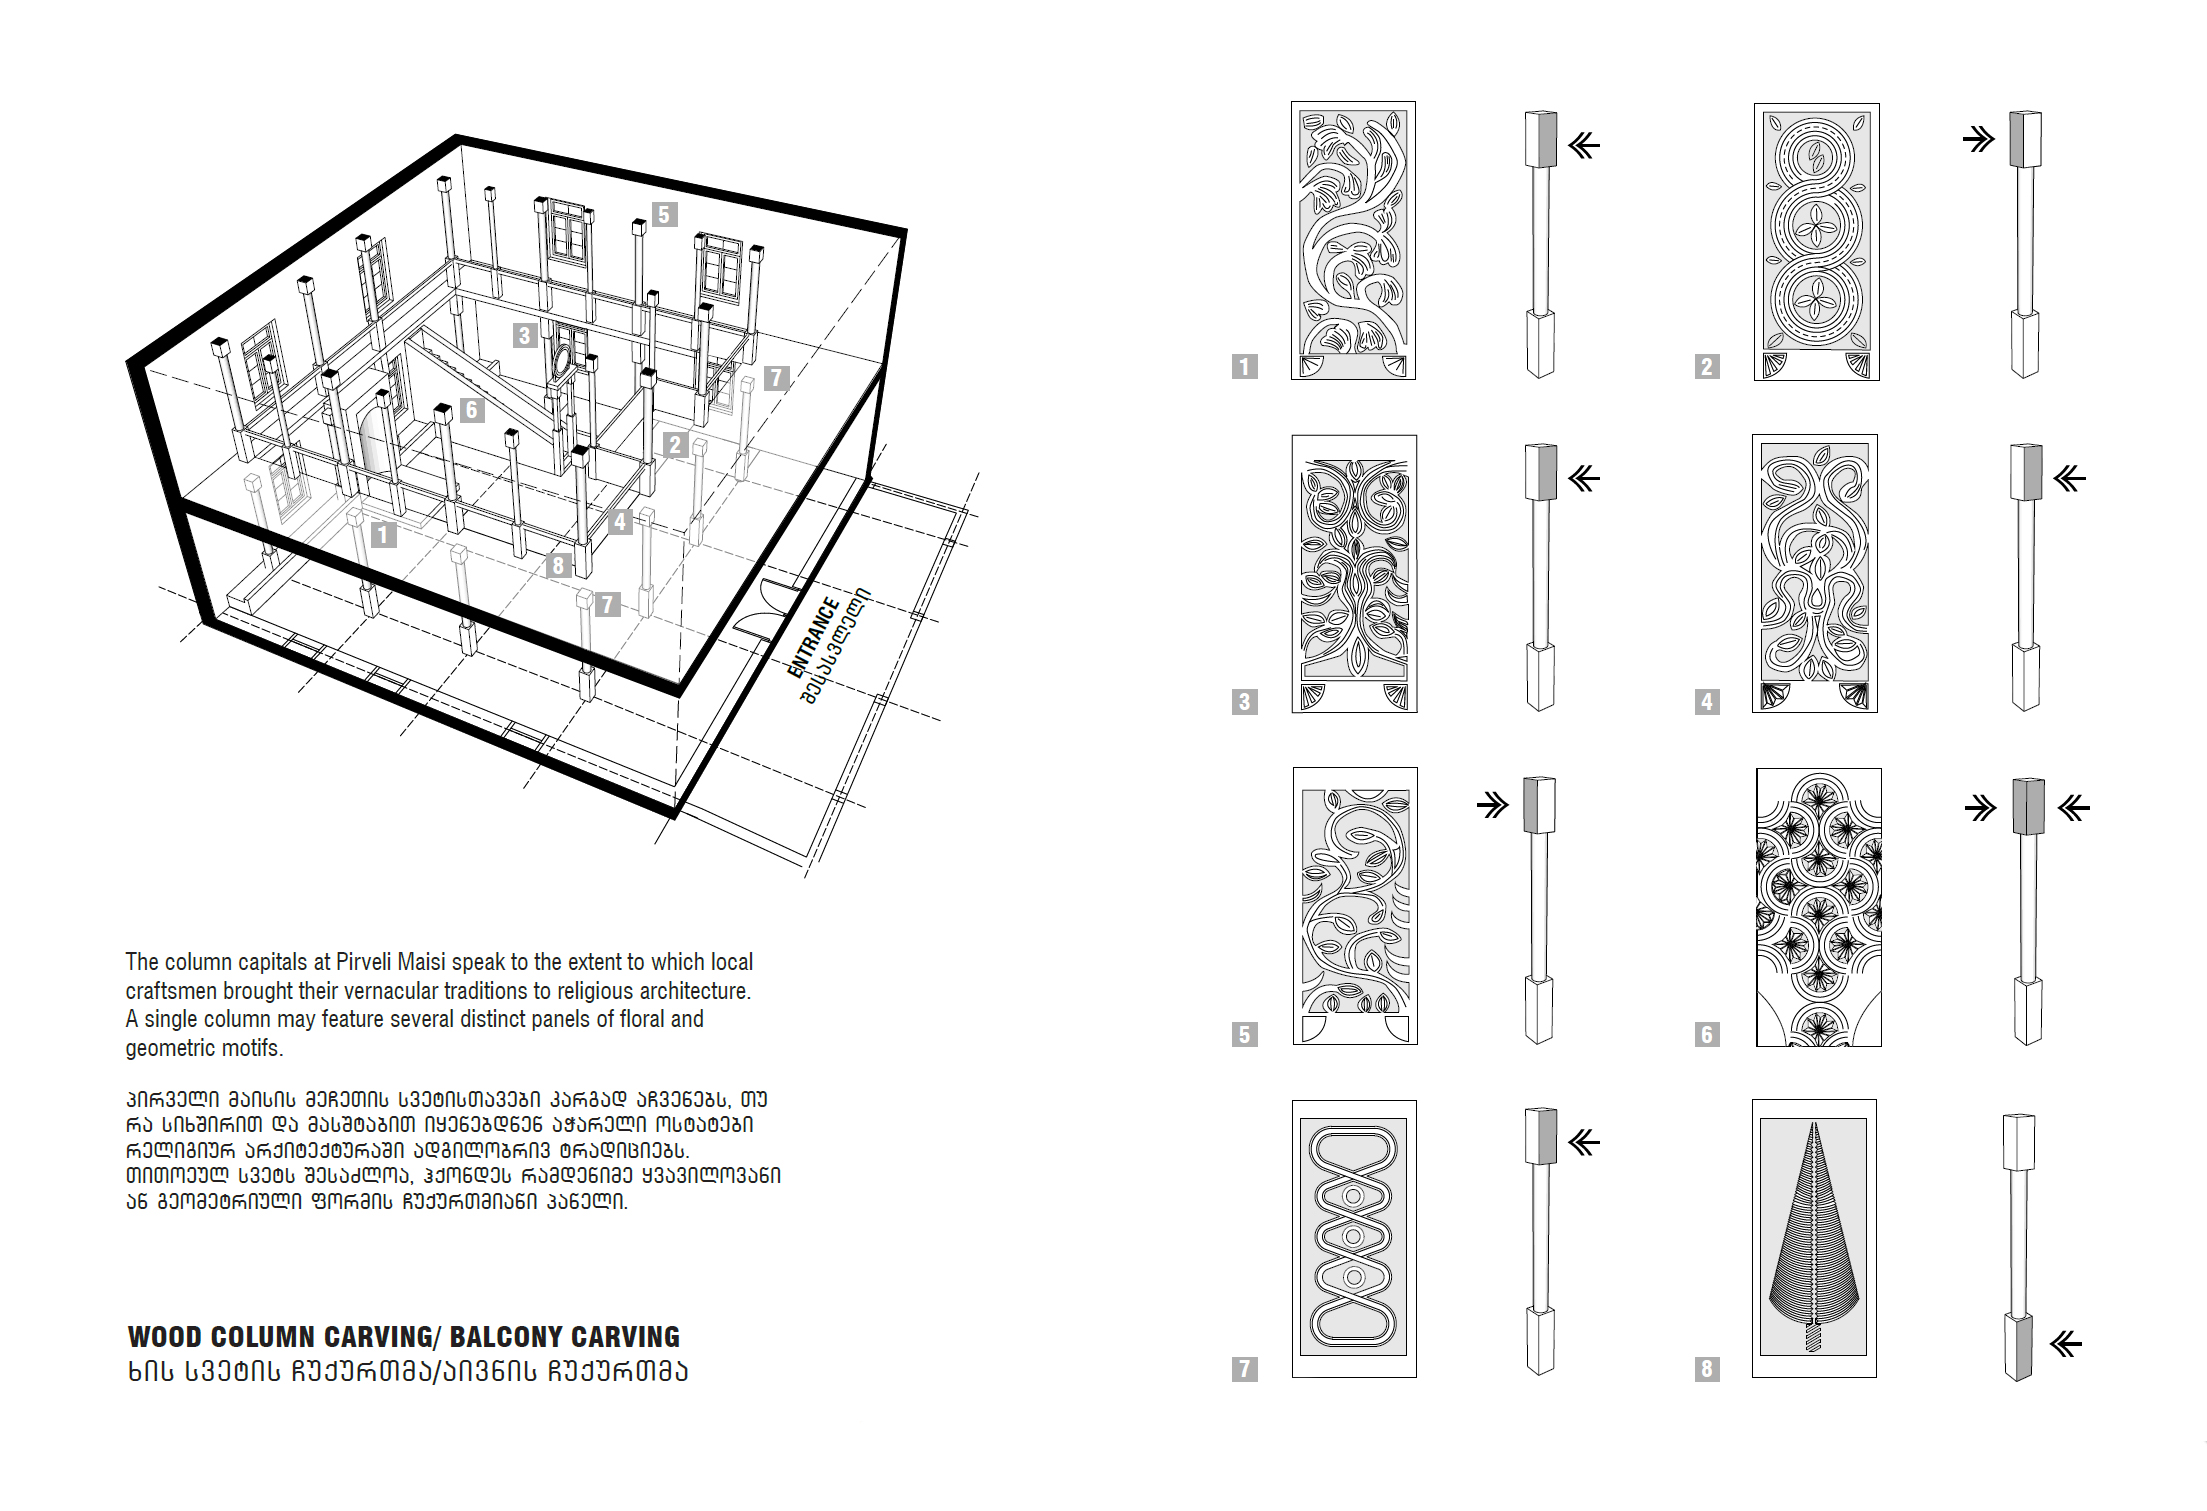 Pirveli Maisi-Columns.jpg